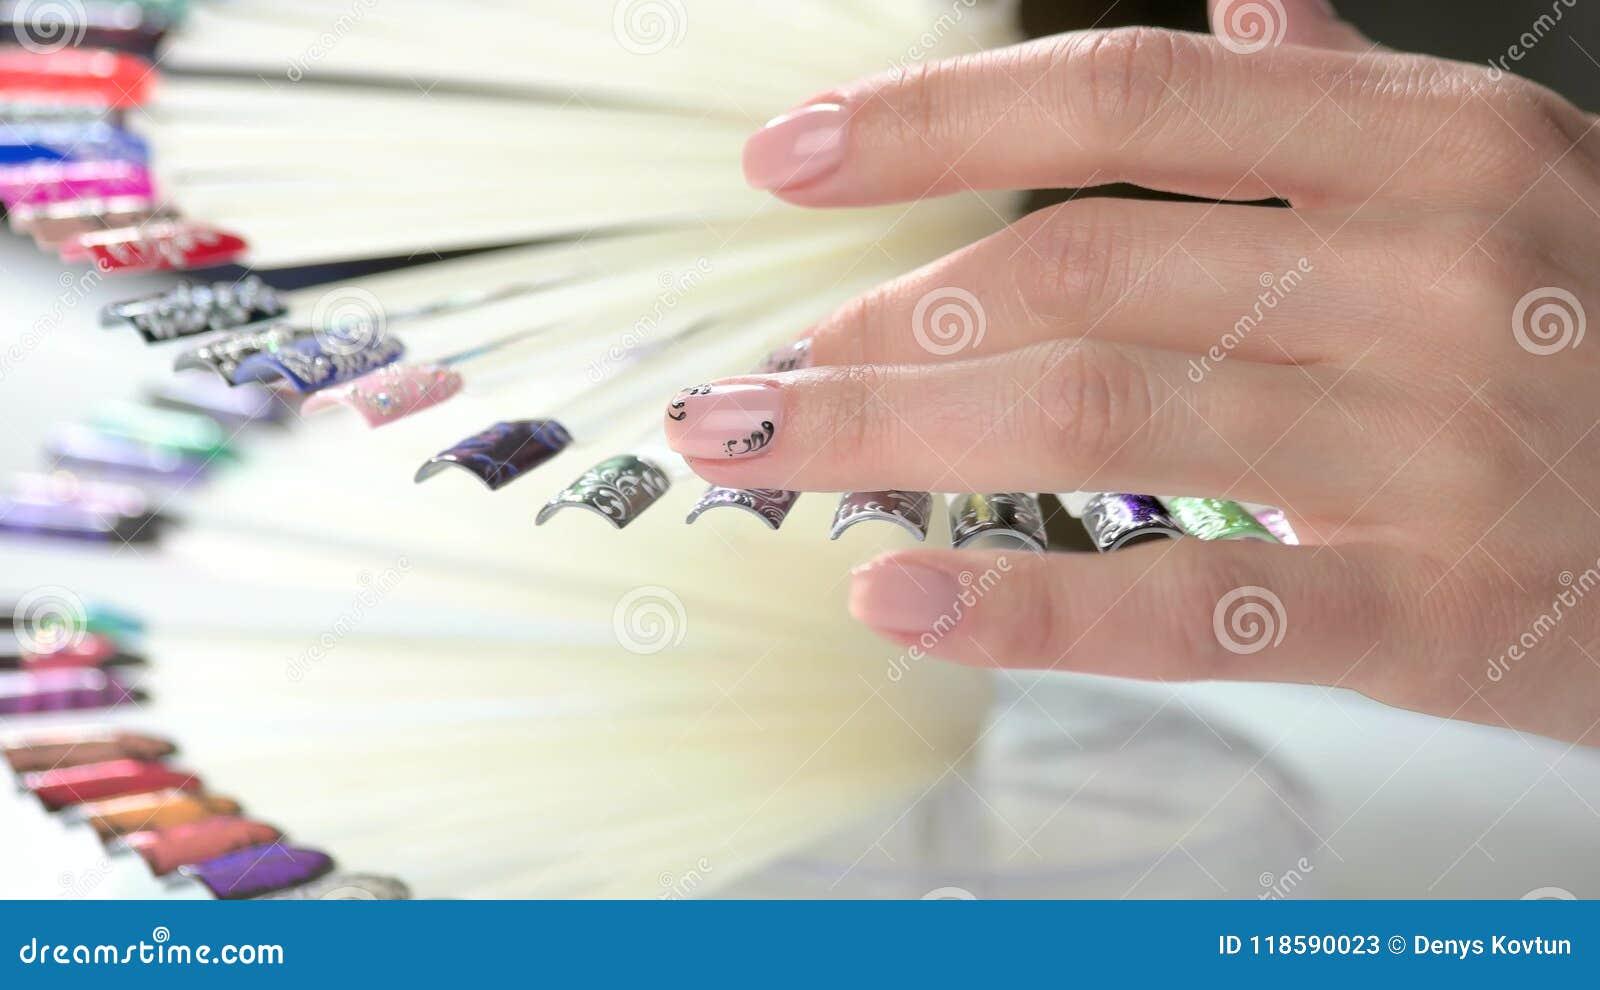 professional studio nail art